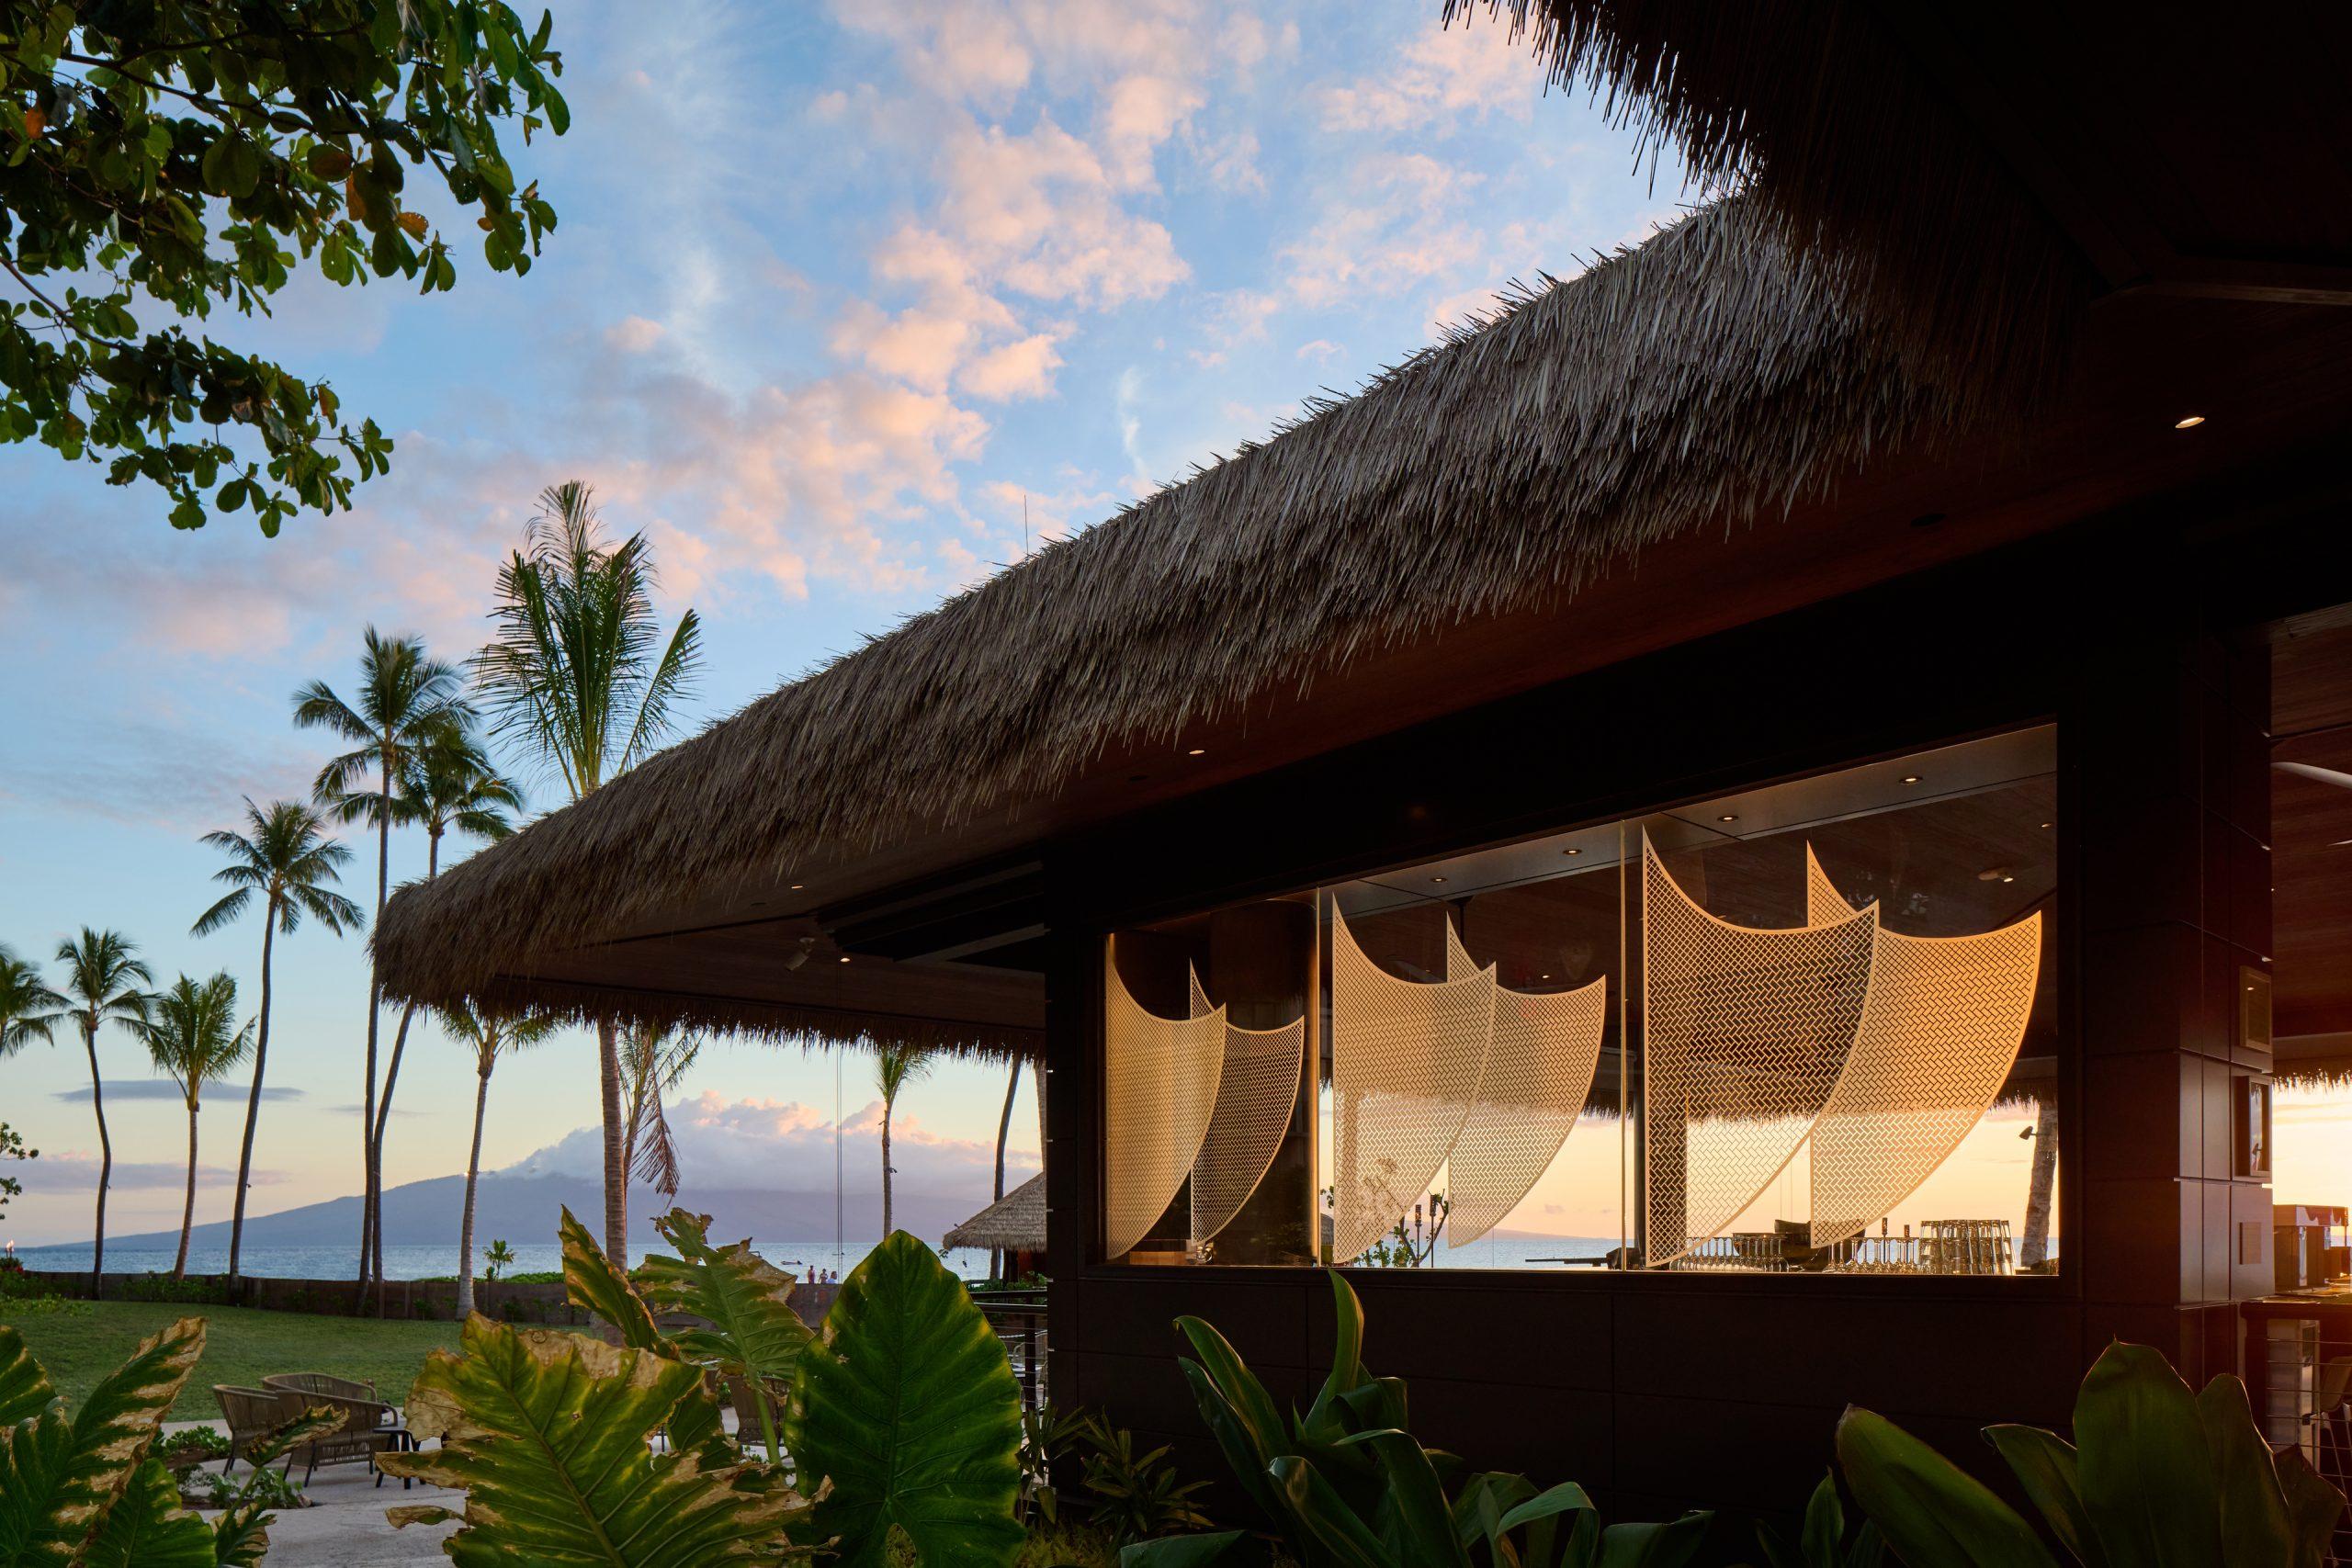 Huihui Restaurant Opens, Part of $75 Million Enhancement at Kā'anapali Beach Hotel